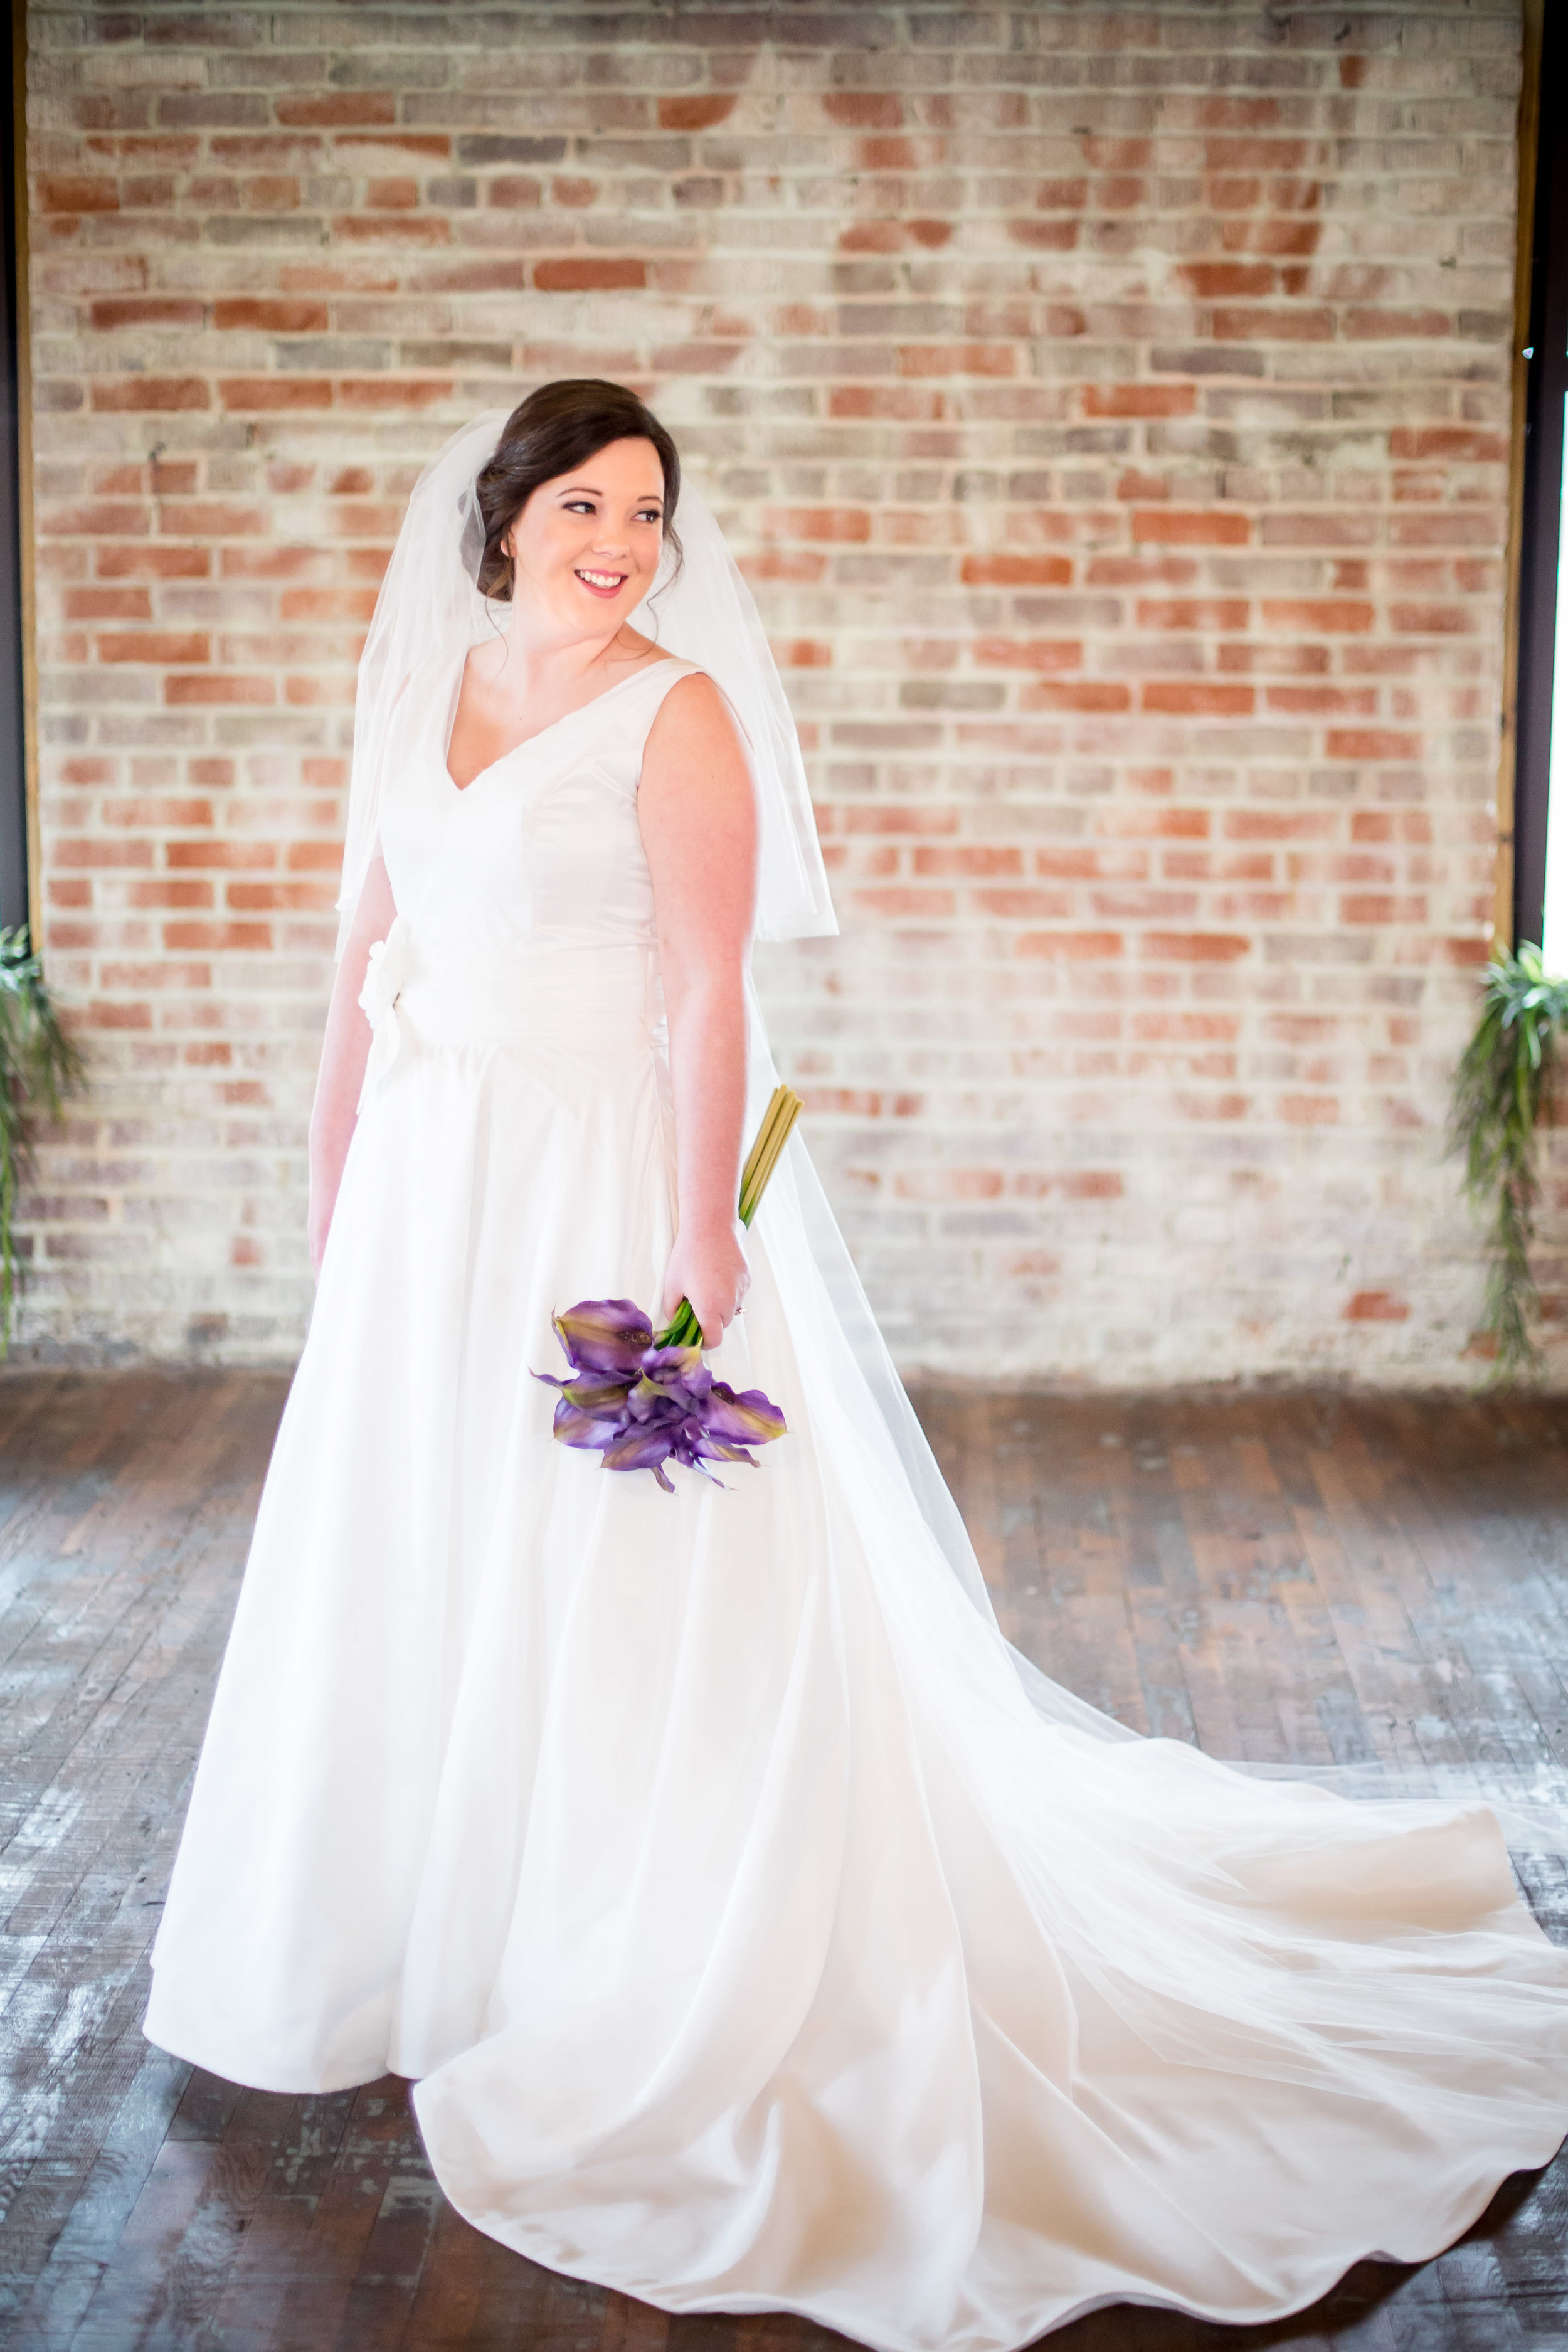 bridal (6 of 23).jpg